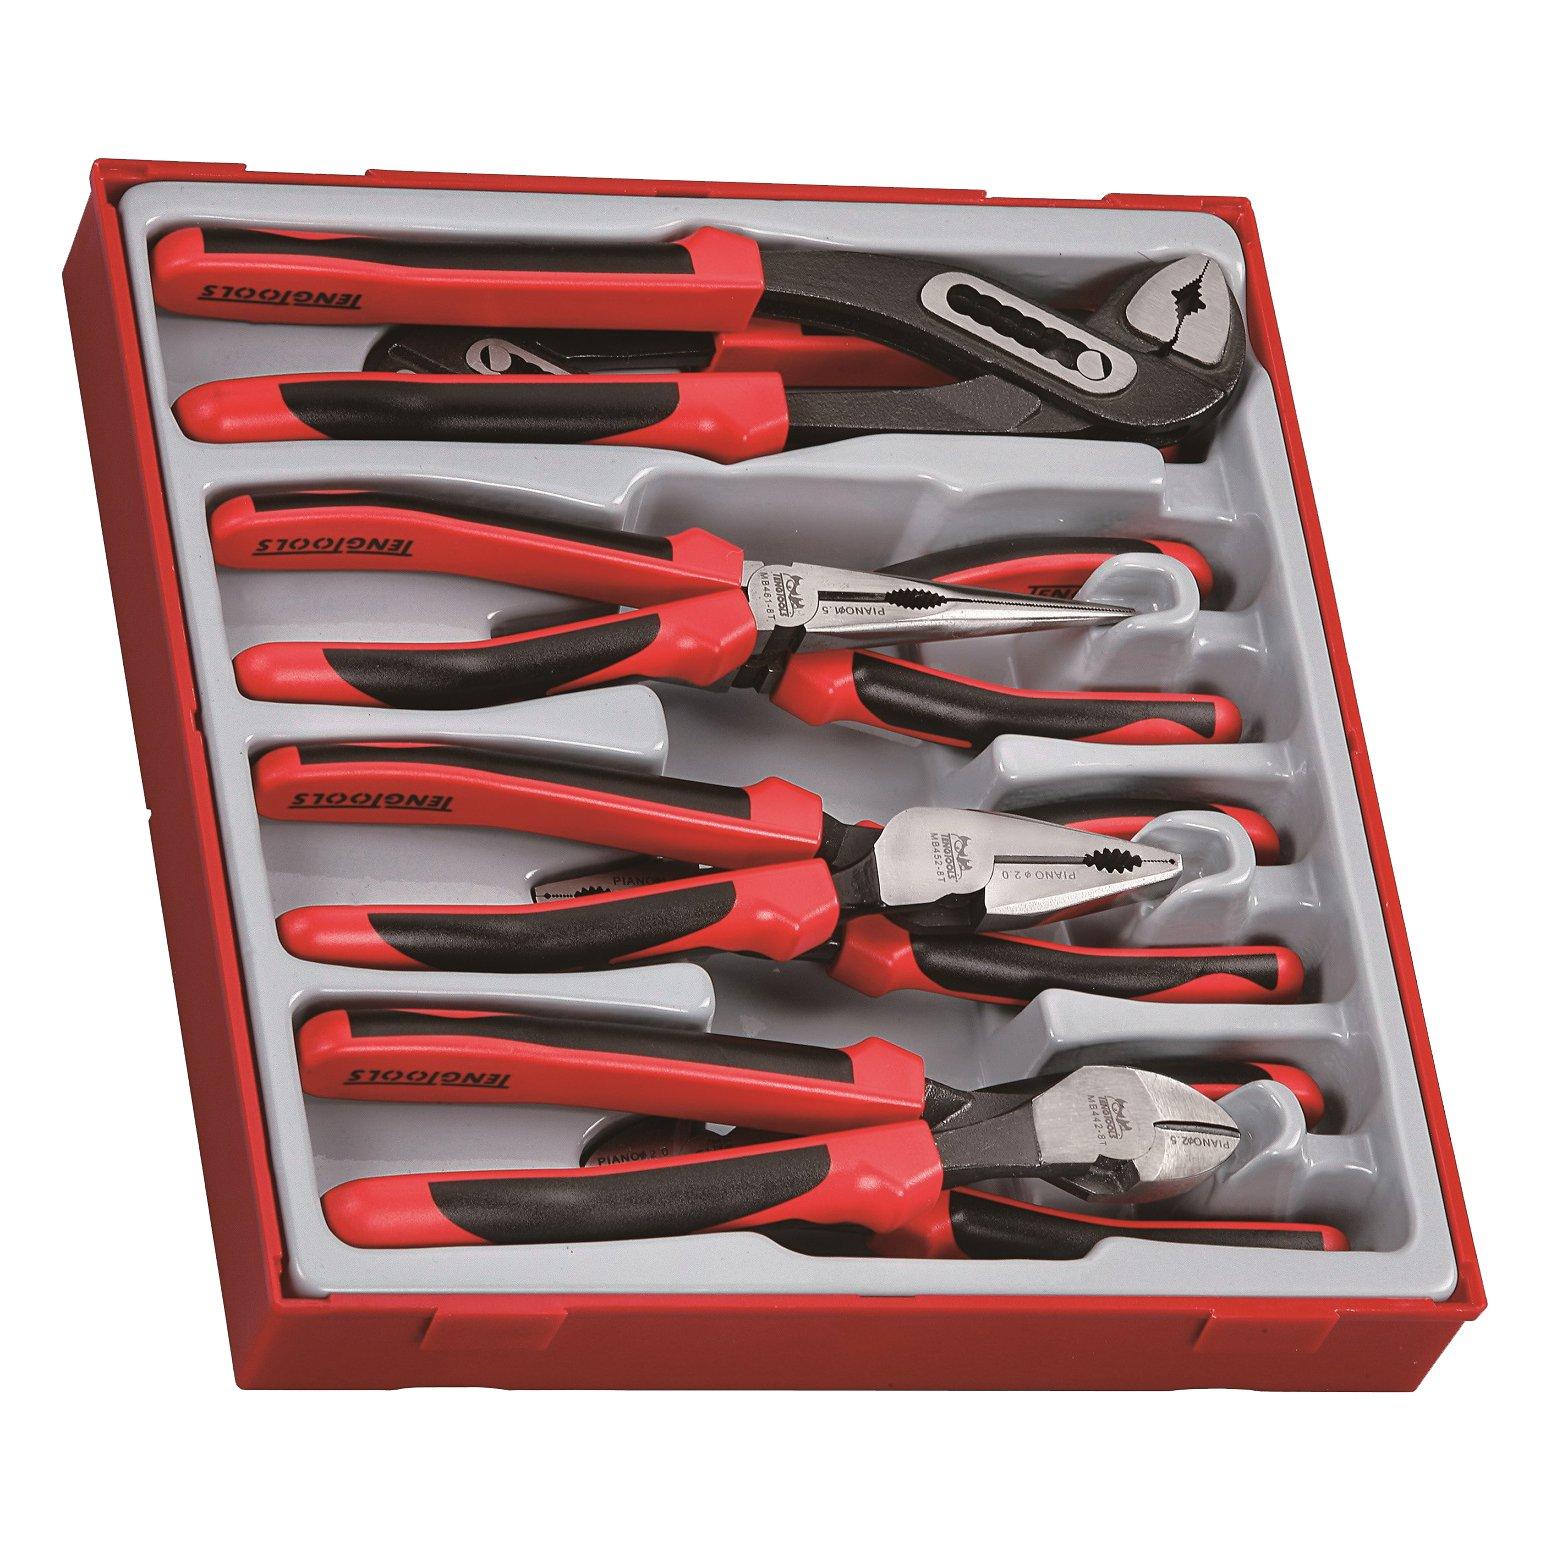 Teng Tools TTD441-T - 8 Piece TPR Grip Plier Set by Teng Tools